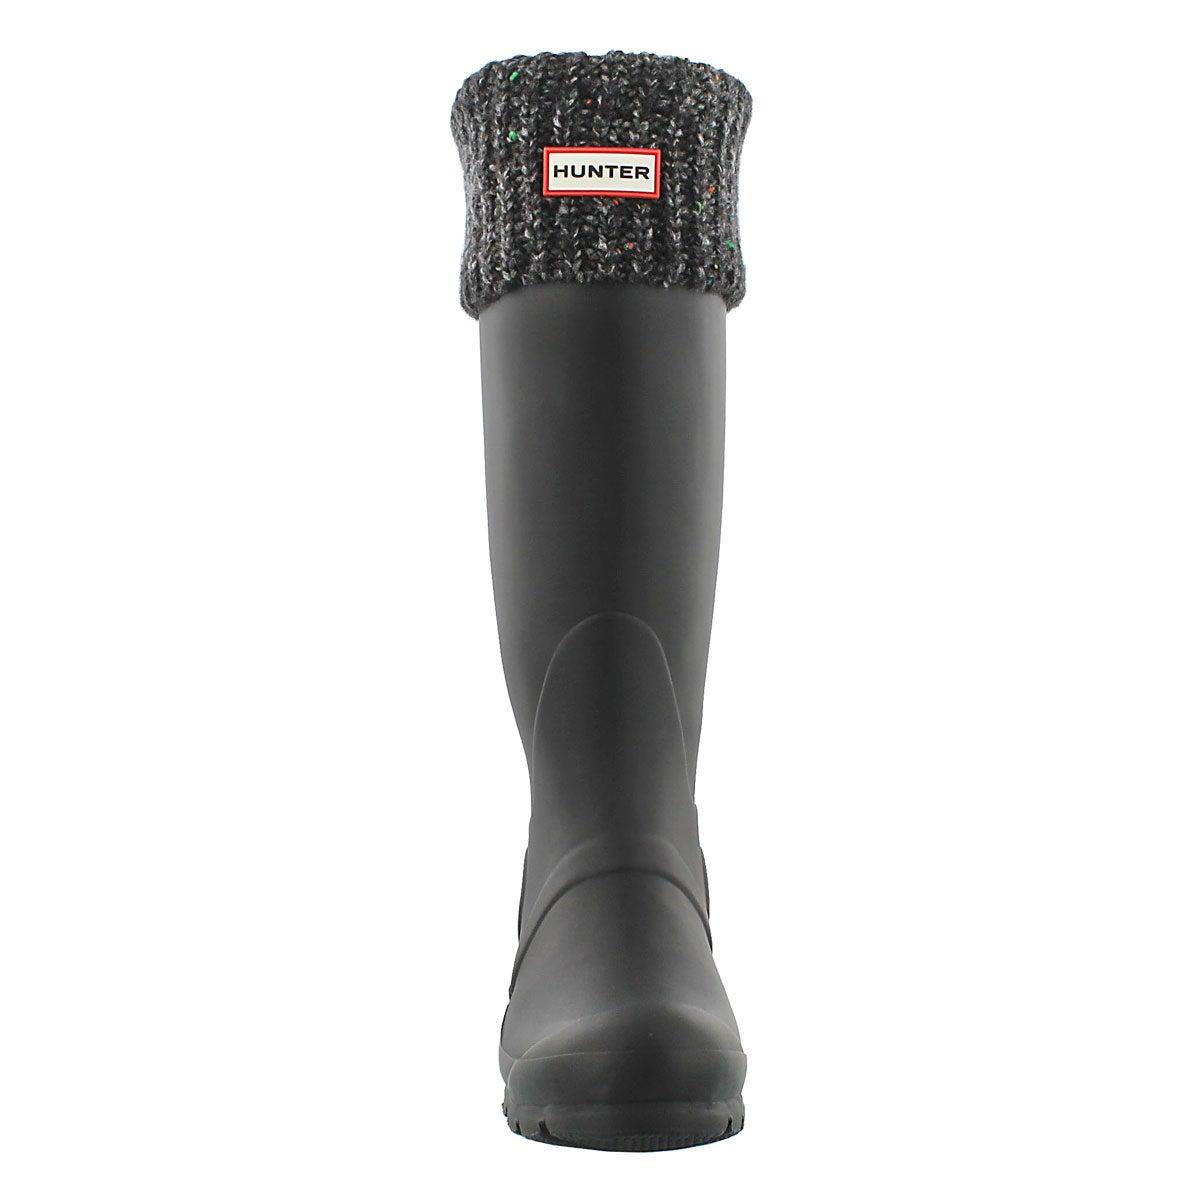 Lds Granite Fleck black boot sock